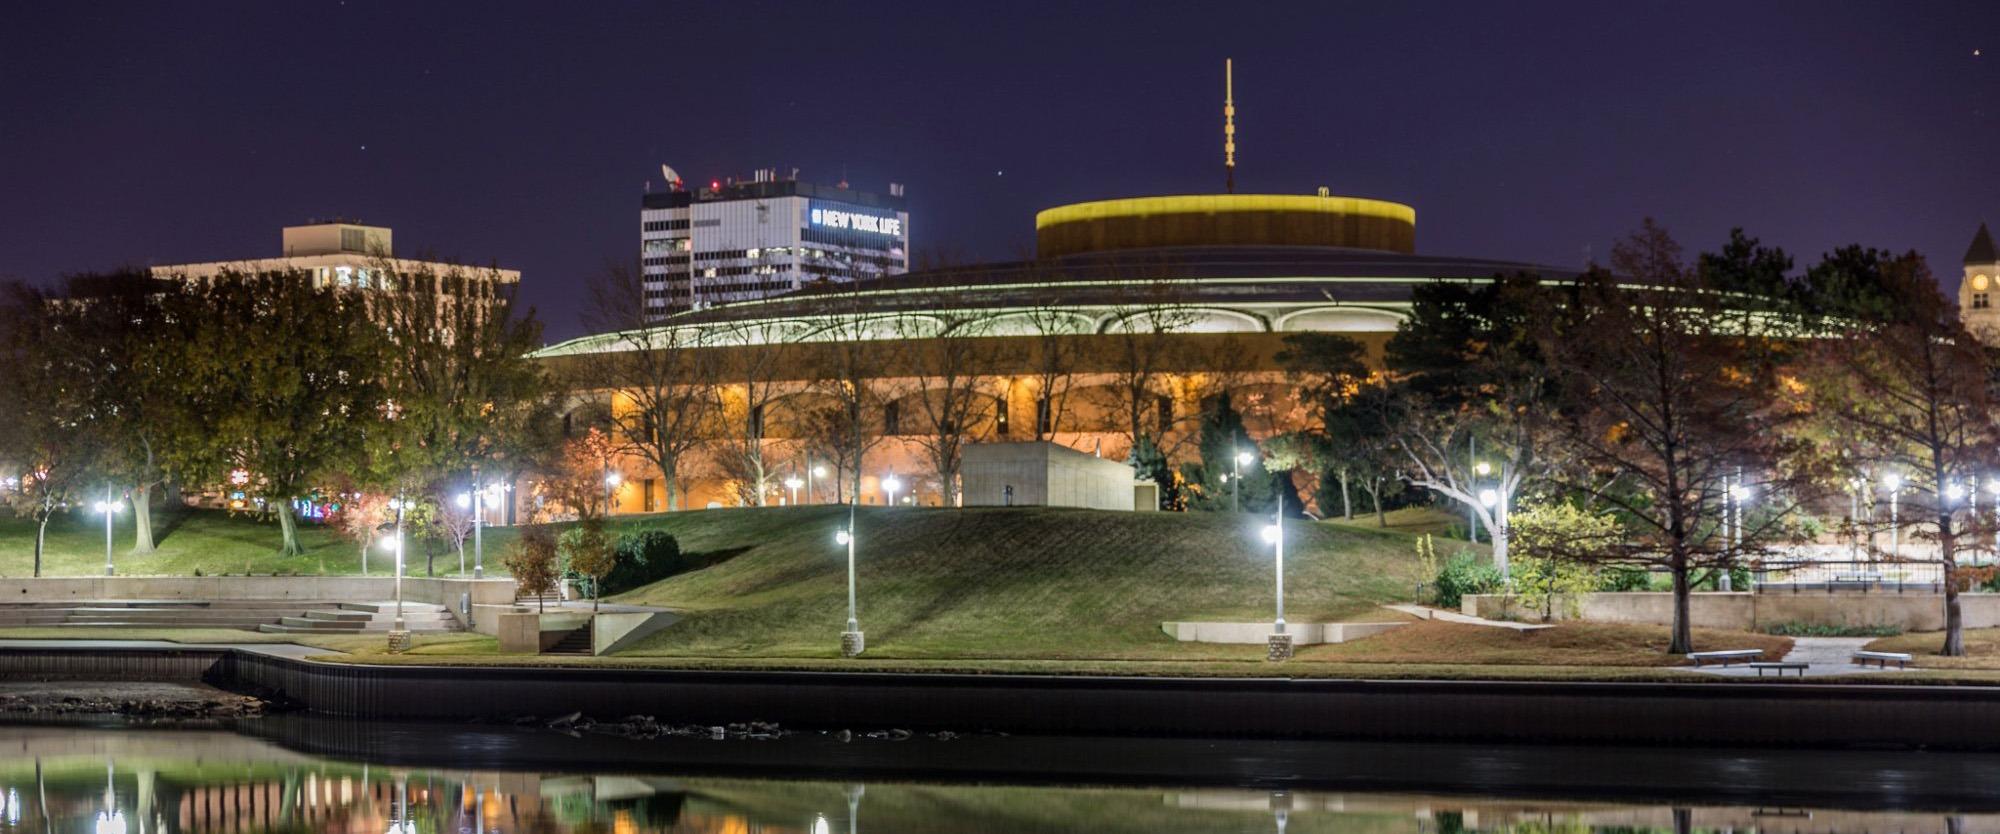 Centuryy II Concert Hall_2.4-1